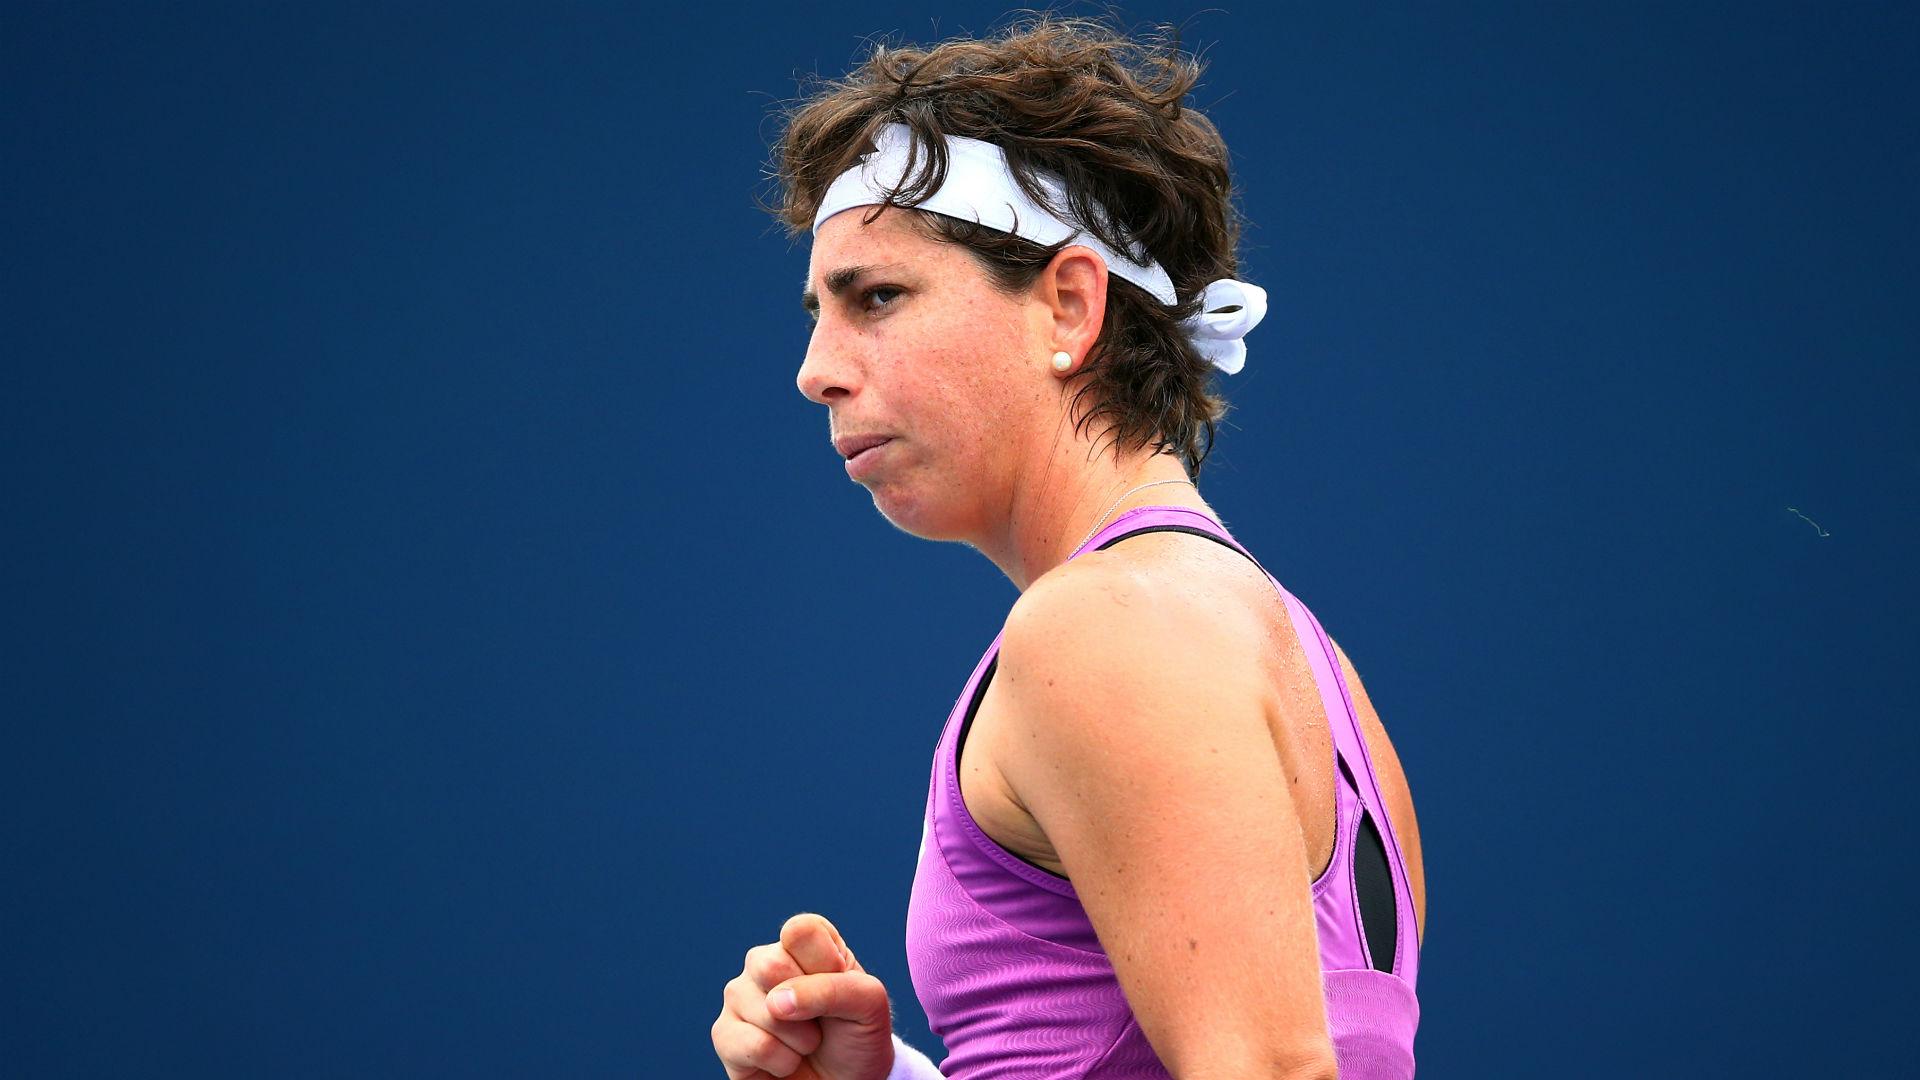 The 2020 WTA season will be the last for Spain's former world number six singles player Carla Suarez Navarro.